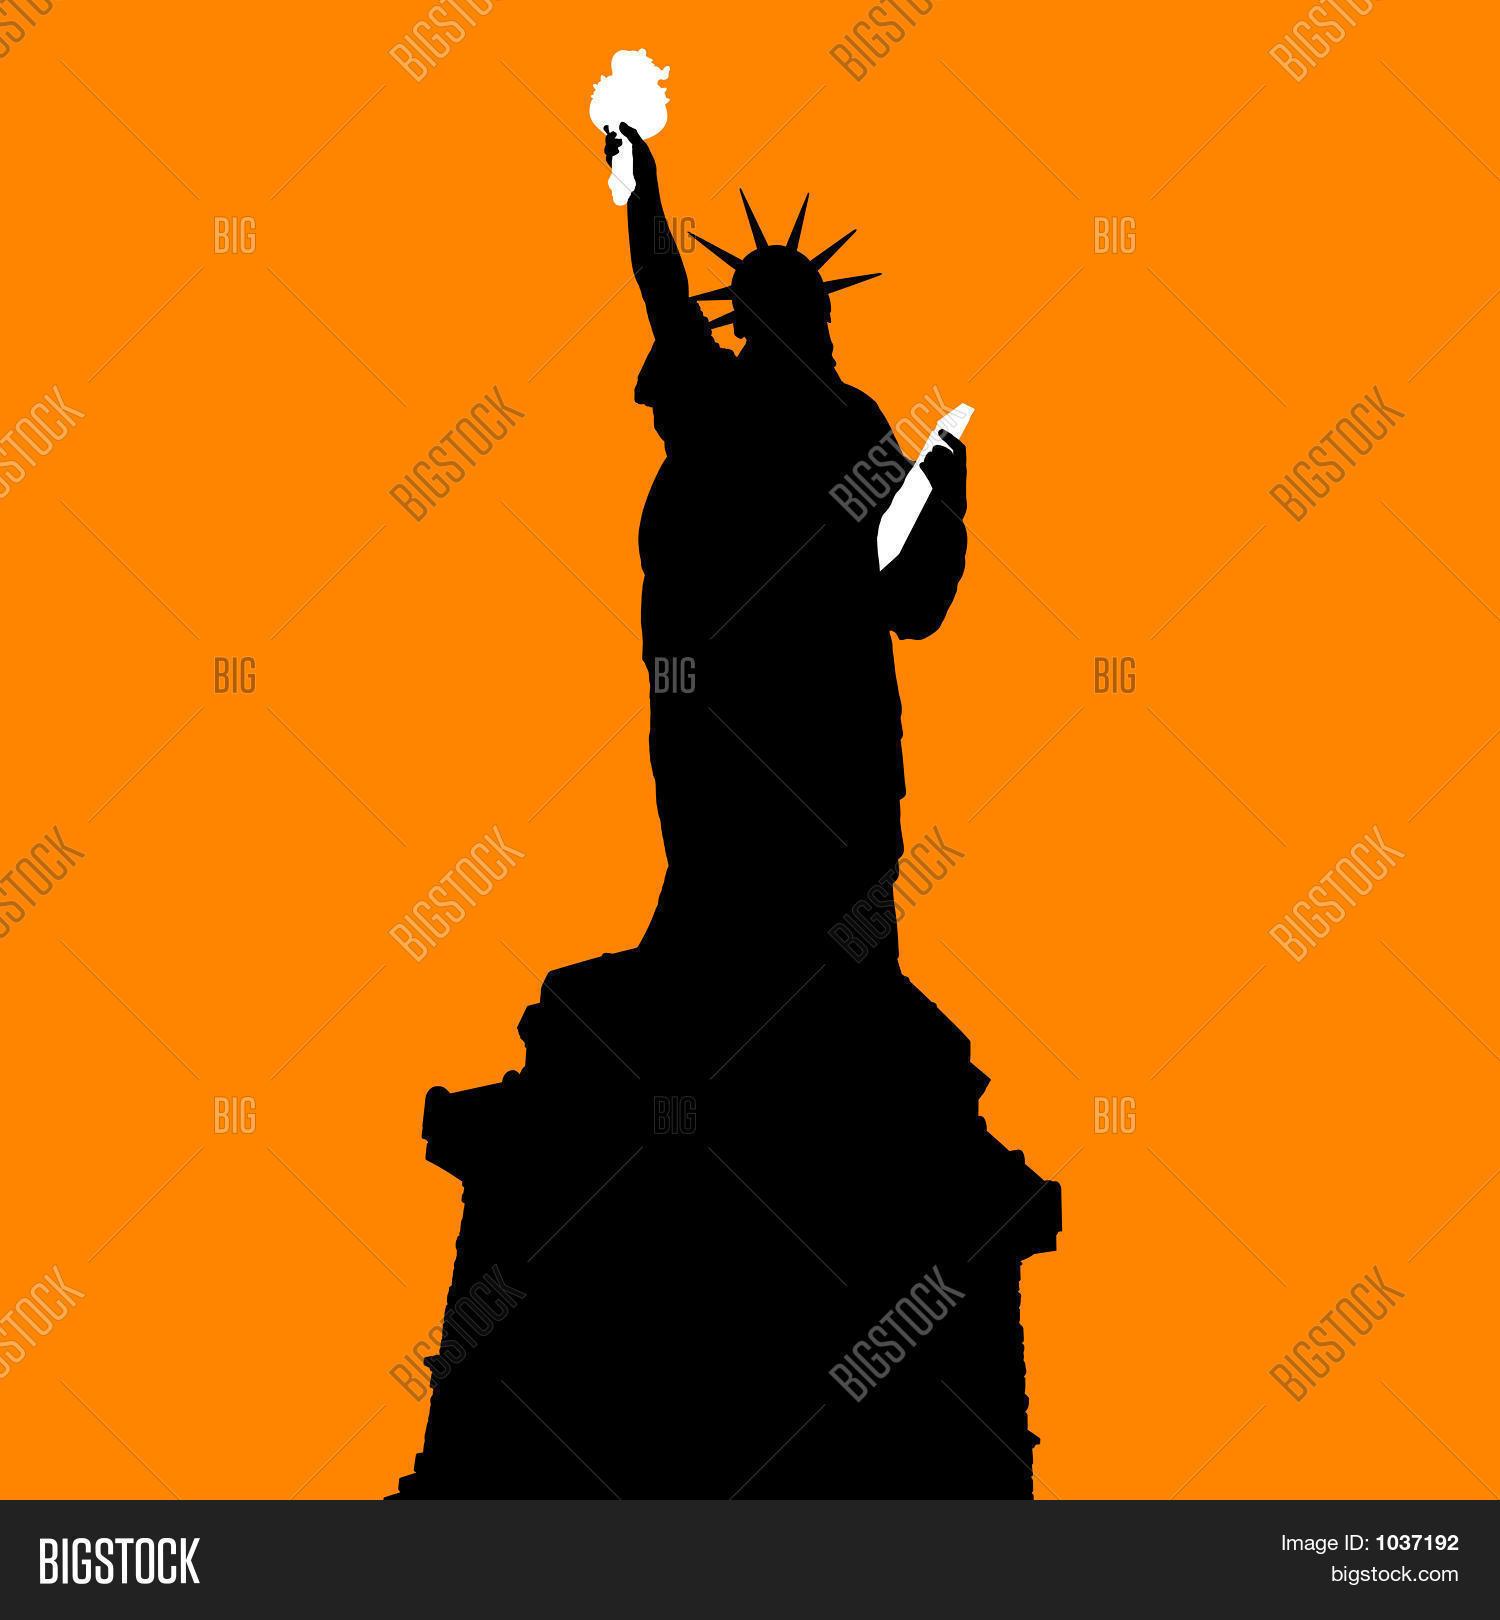 statue liberty on image photo free trial bigstock